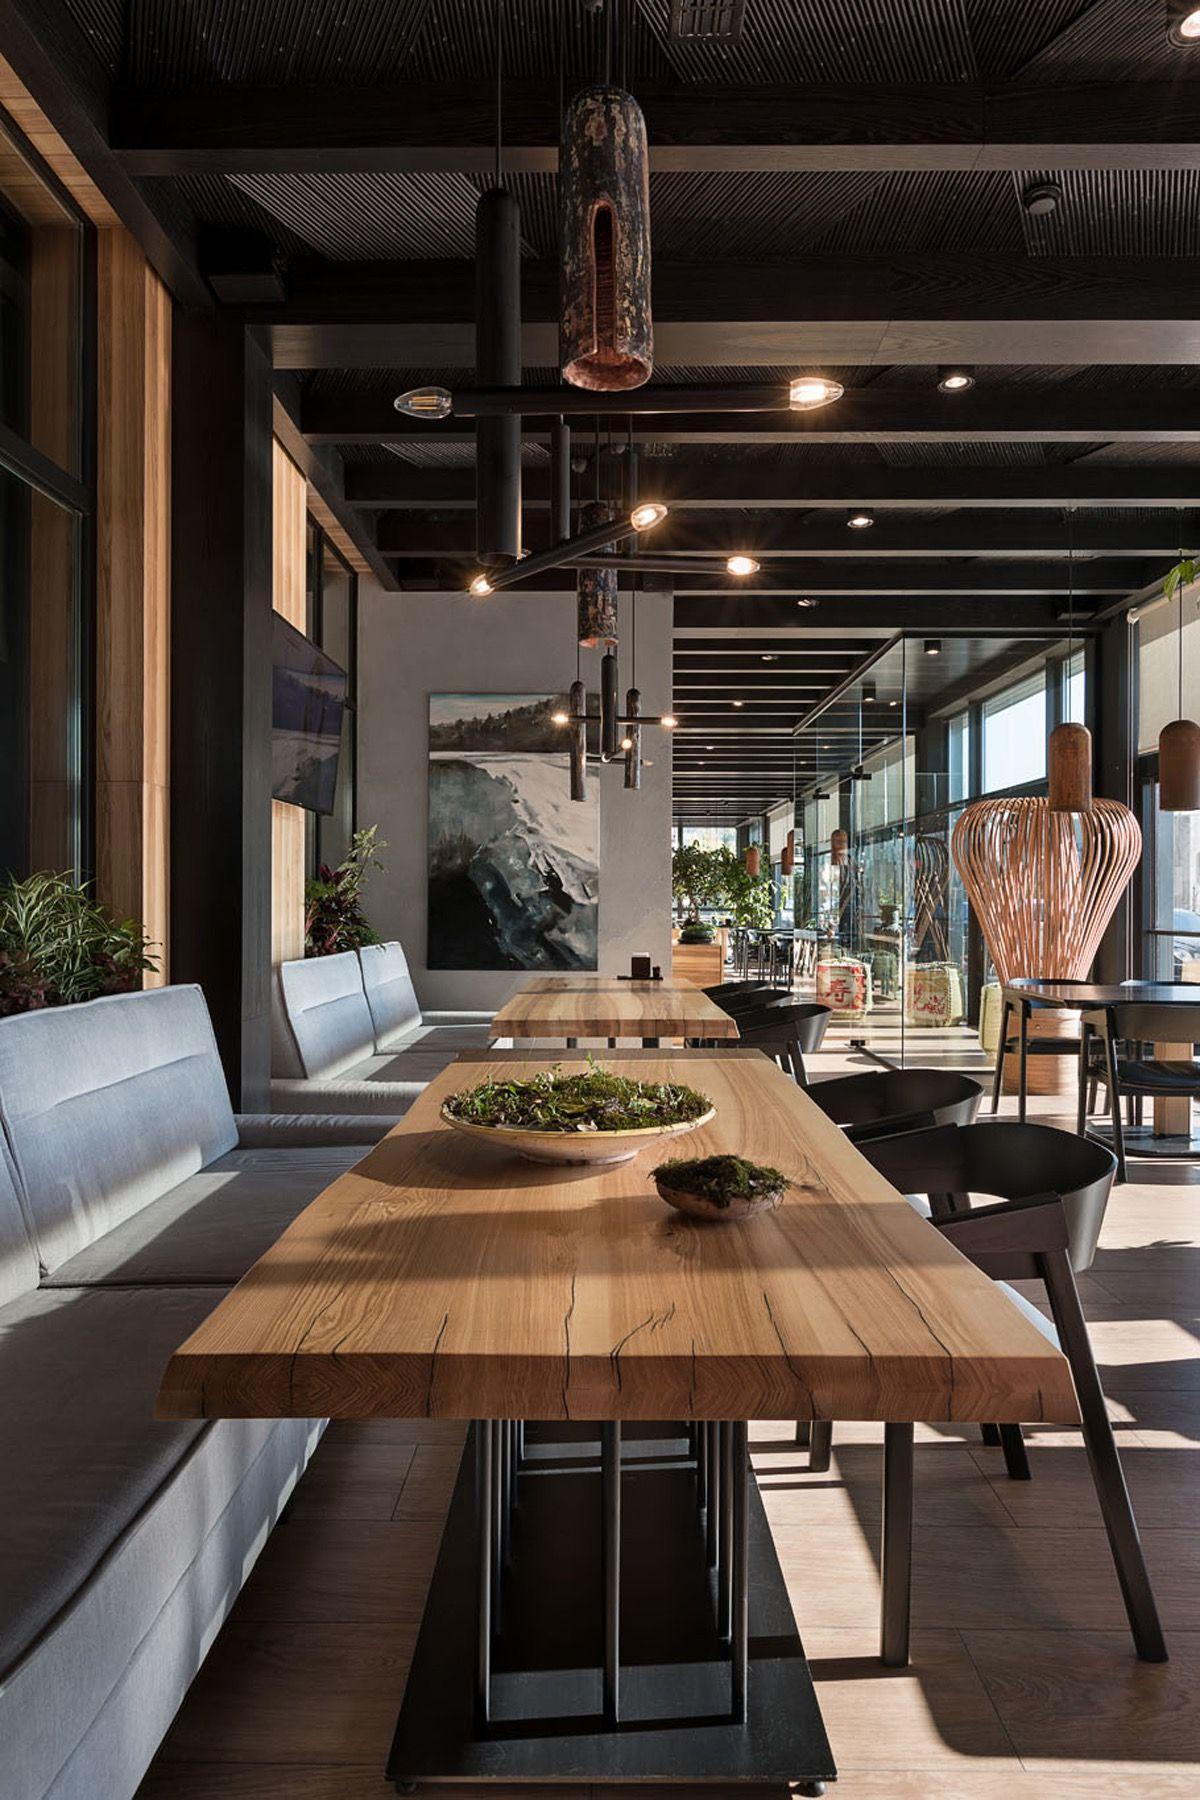 Housing Market Predictions 2021 Will It Crash In 2021 Or 2022 Japanese Restaurant Interior Modern Restaurant Modern Restaurant Design